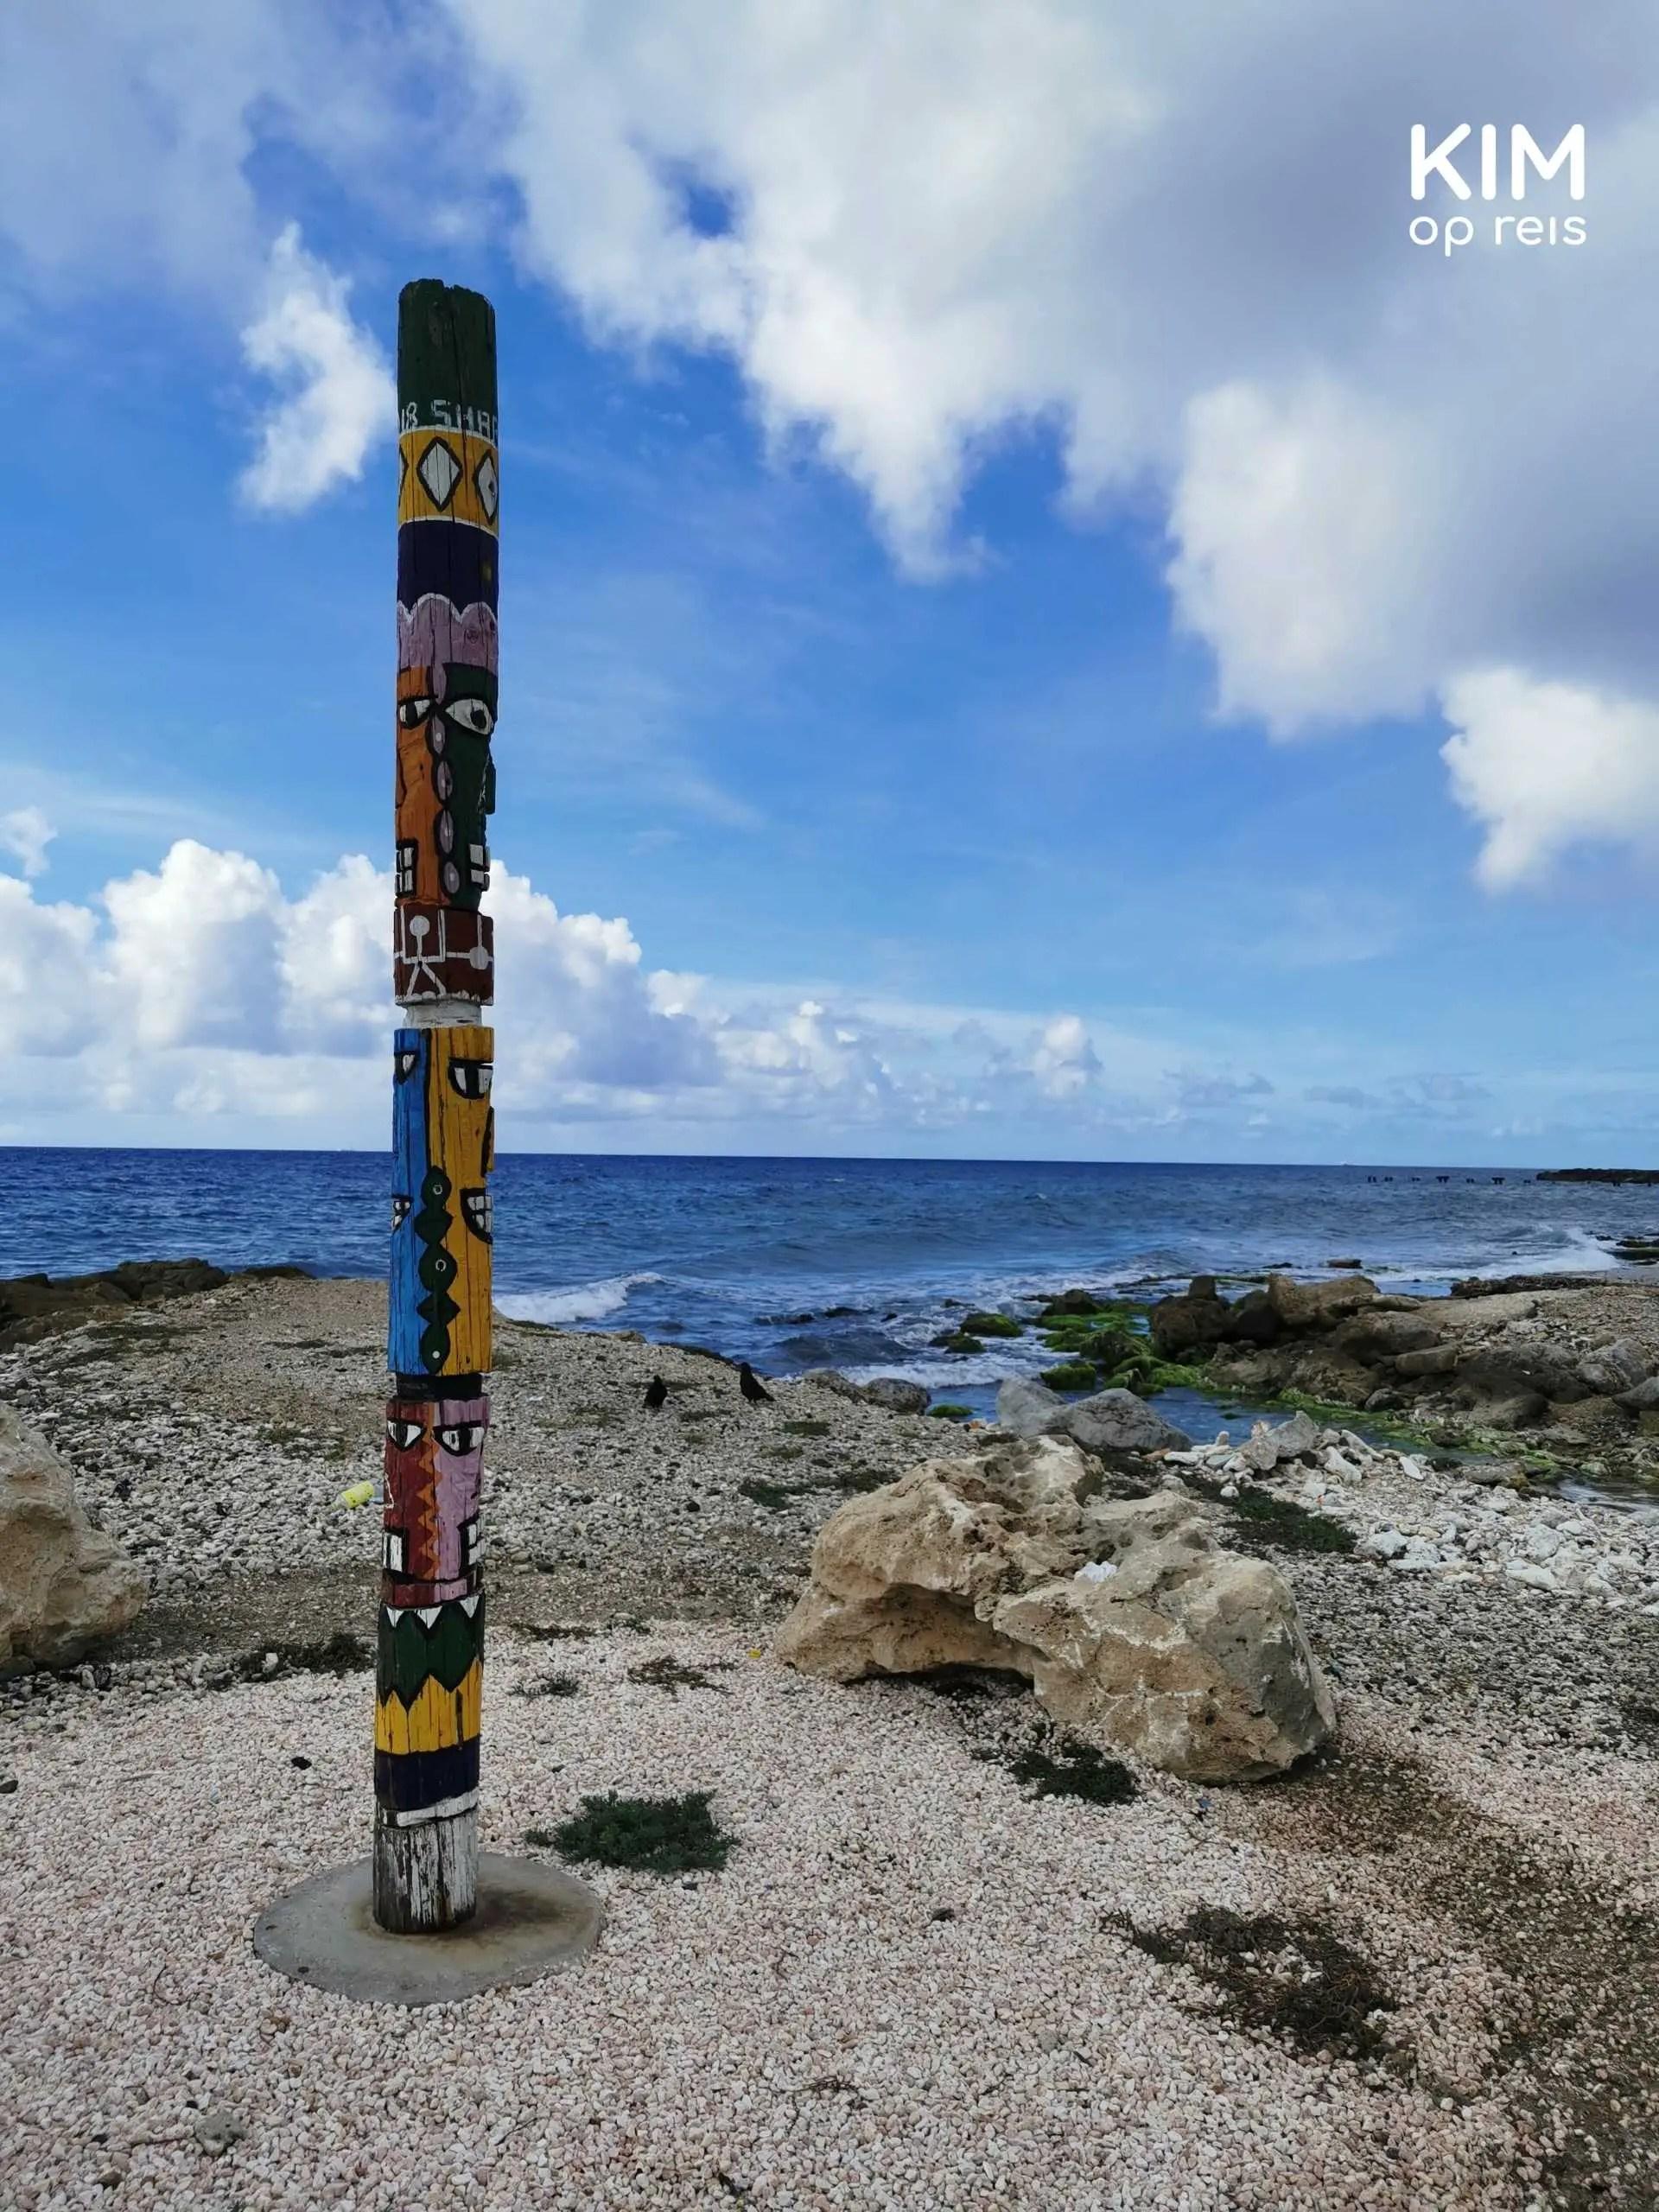 Parke Lucha pa Libertat Curaçao: totempaal aan de rand van de zee